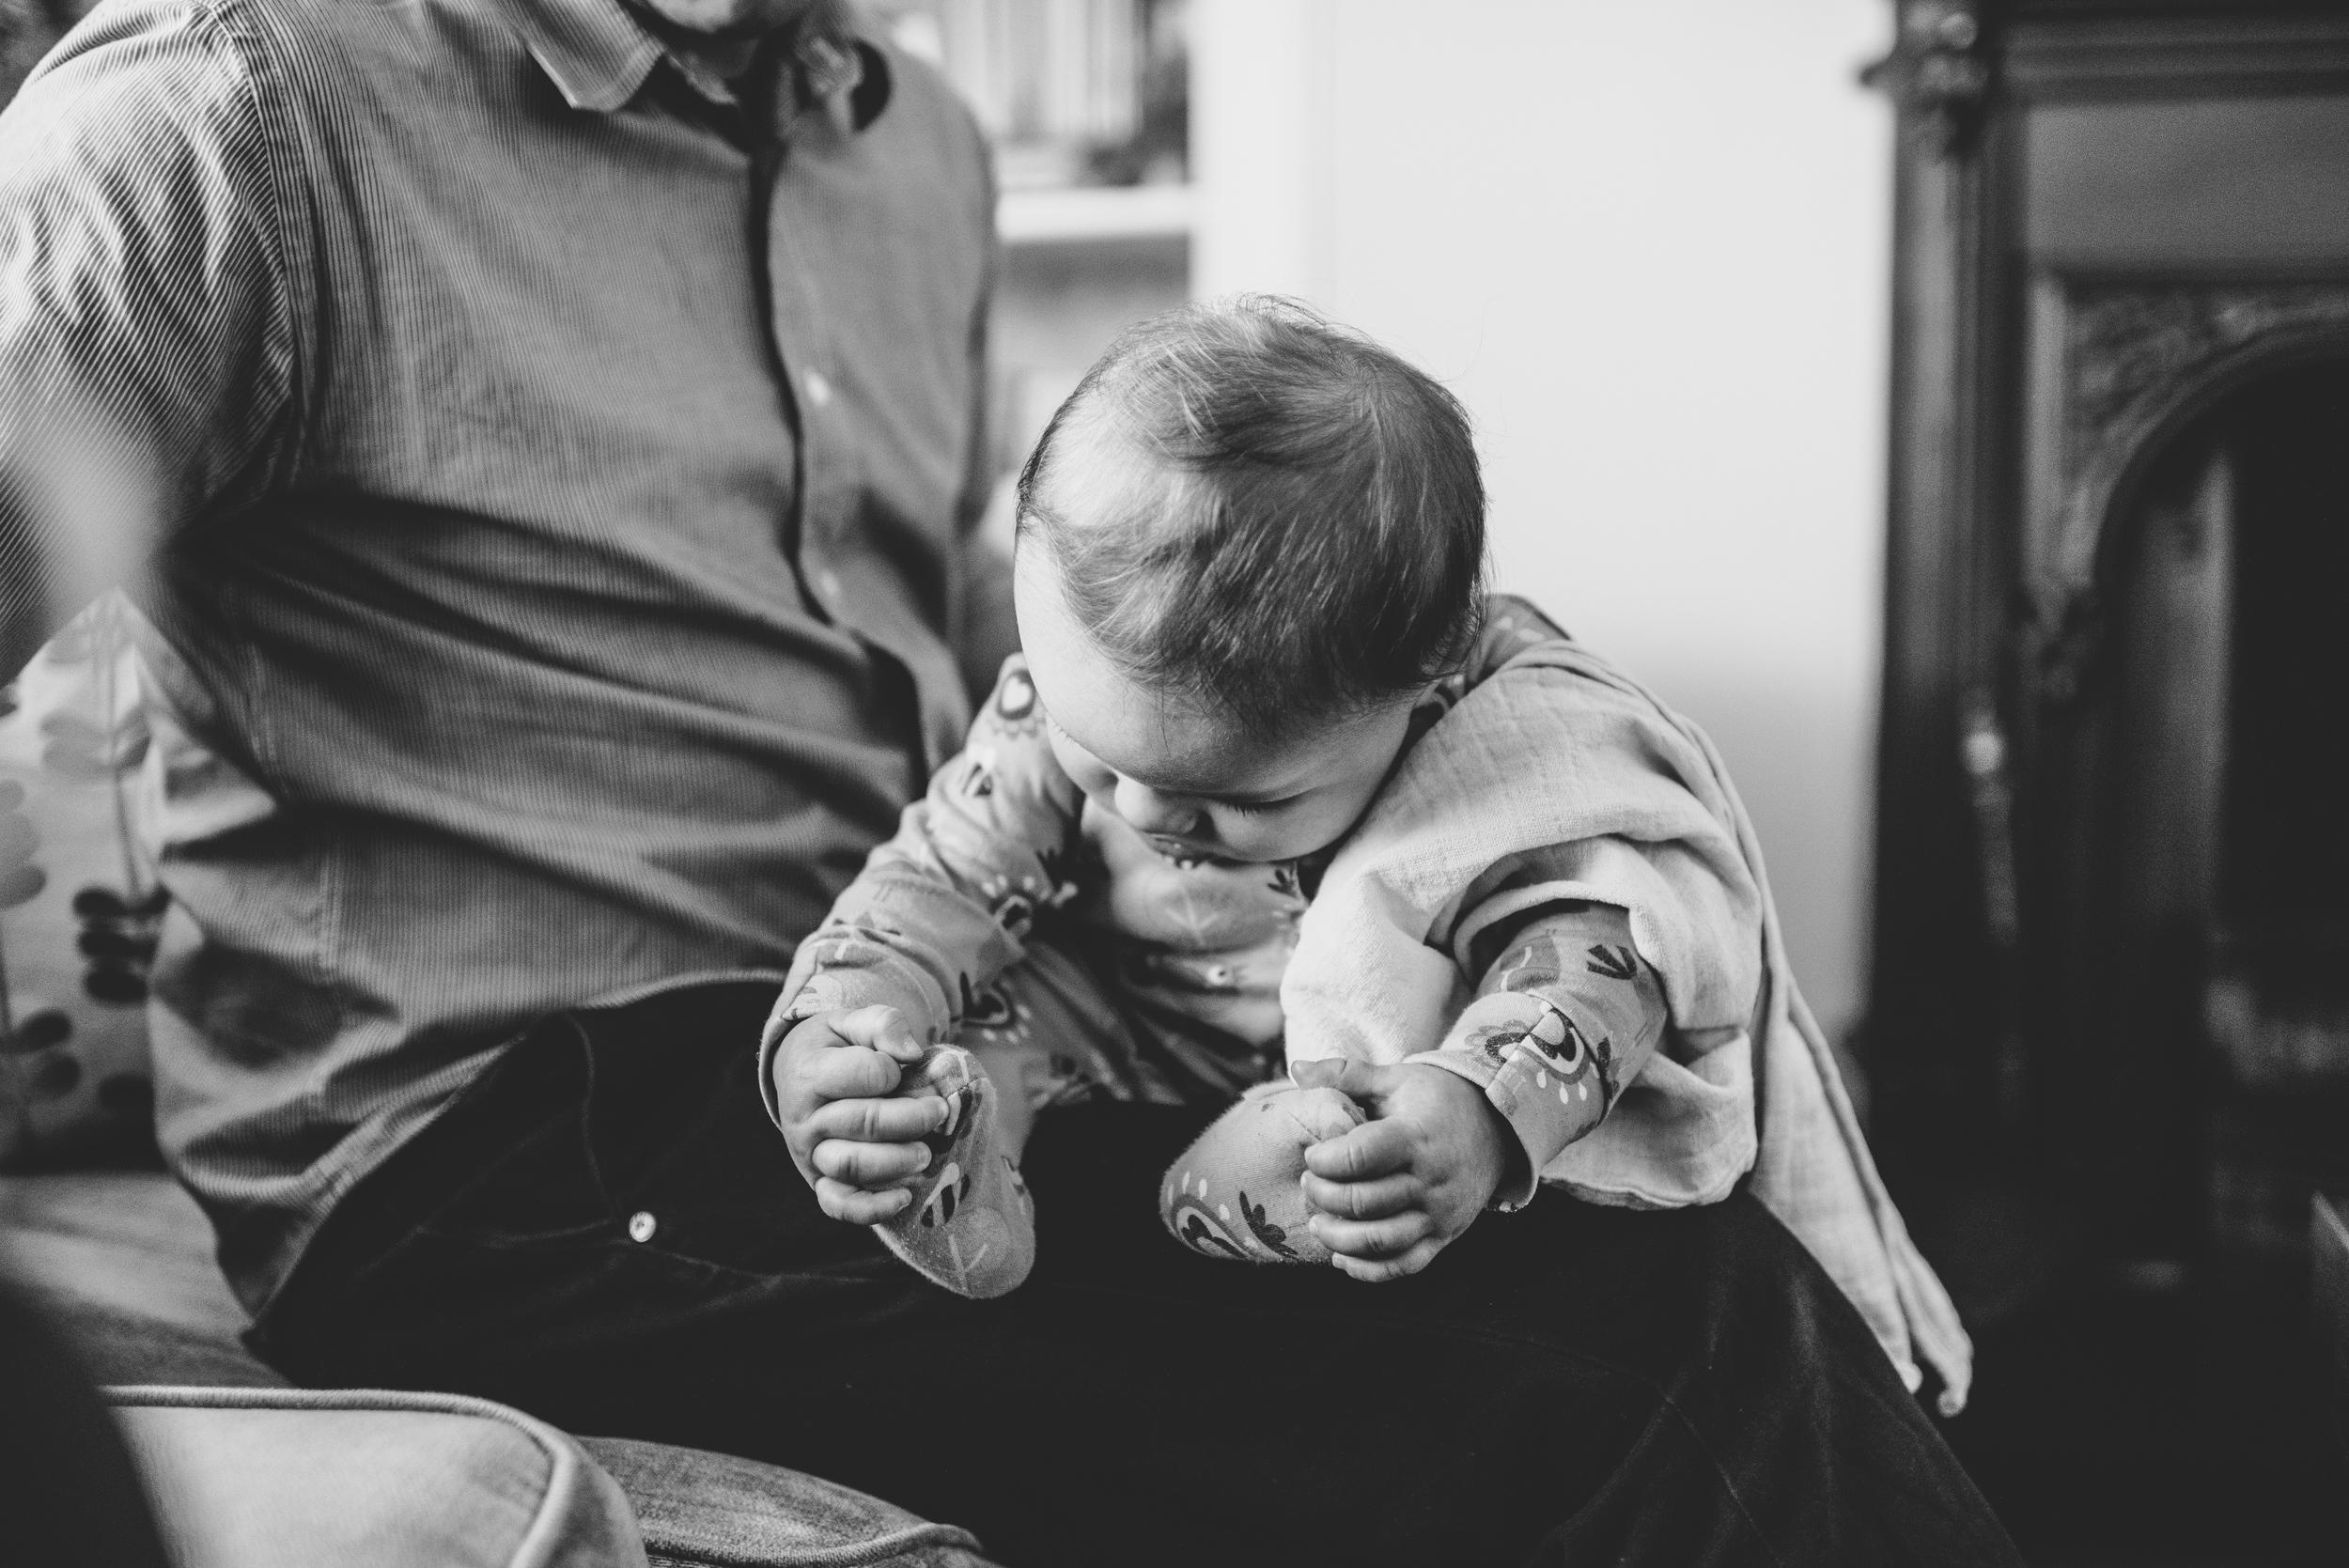 0019-ALTERNATIVE-WEDDING-PHOTOGRAPHER-GLASGOW-FAMILY-PHOTOGRAPHER-KIDS-PORTRAITS-BABY-PORTRAITS-GLASGOW.JPG